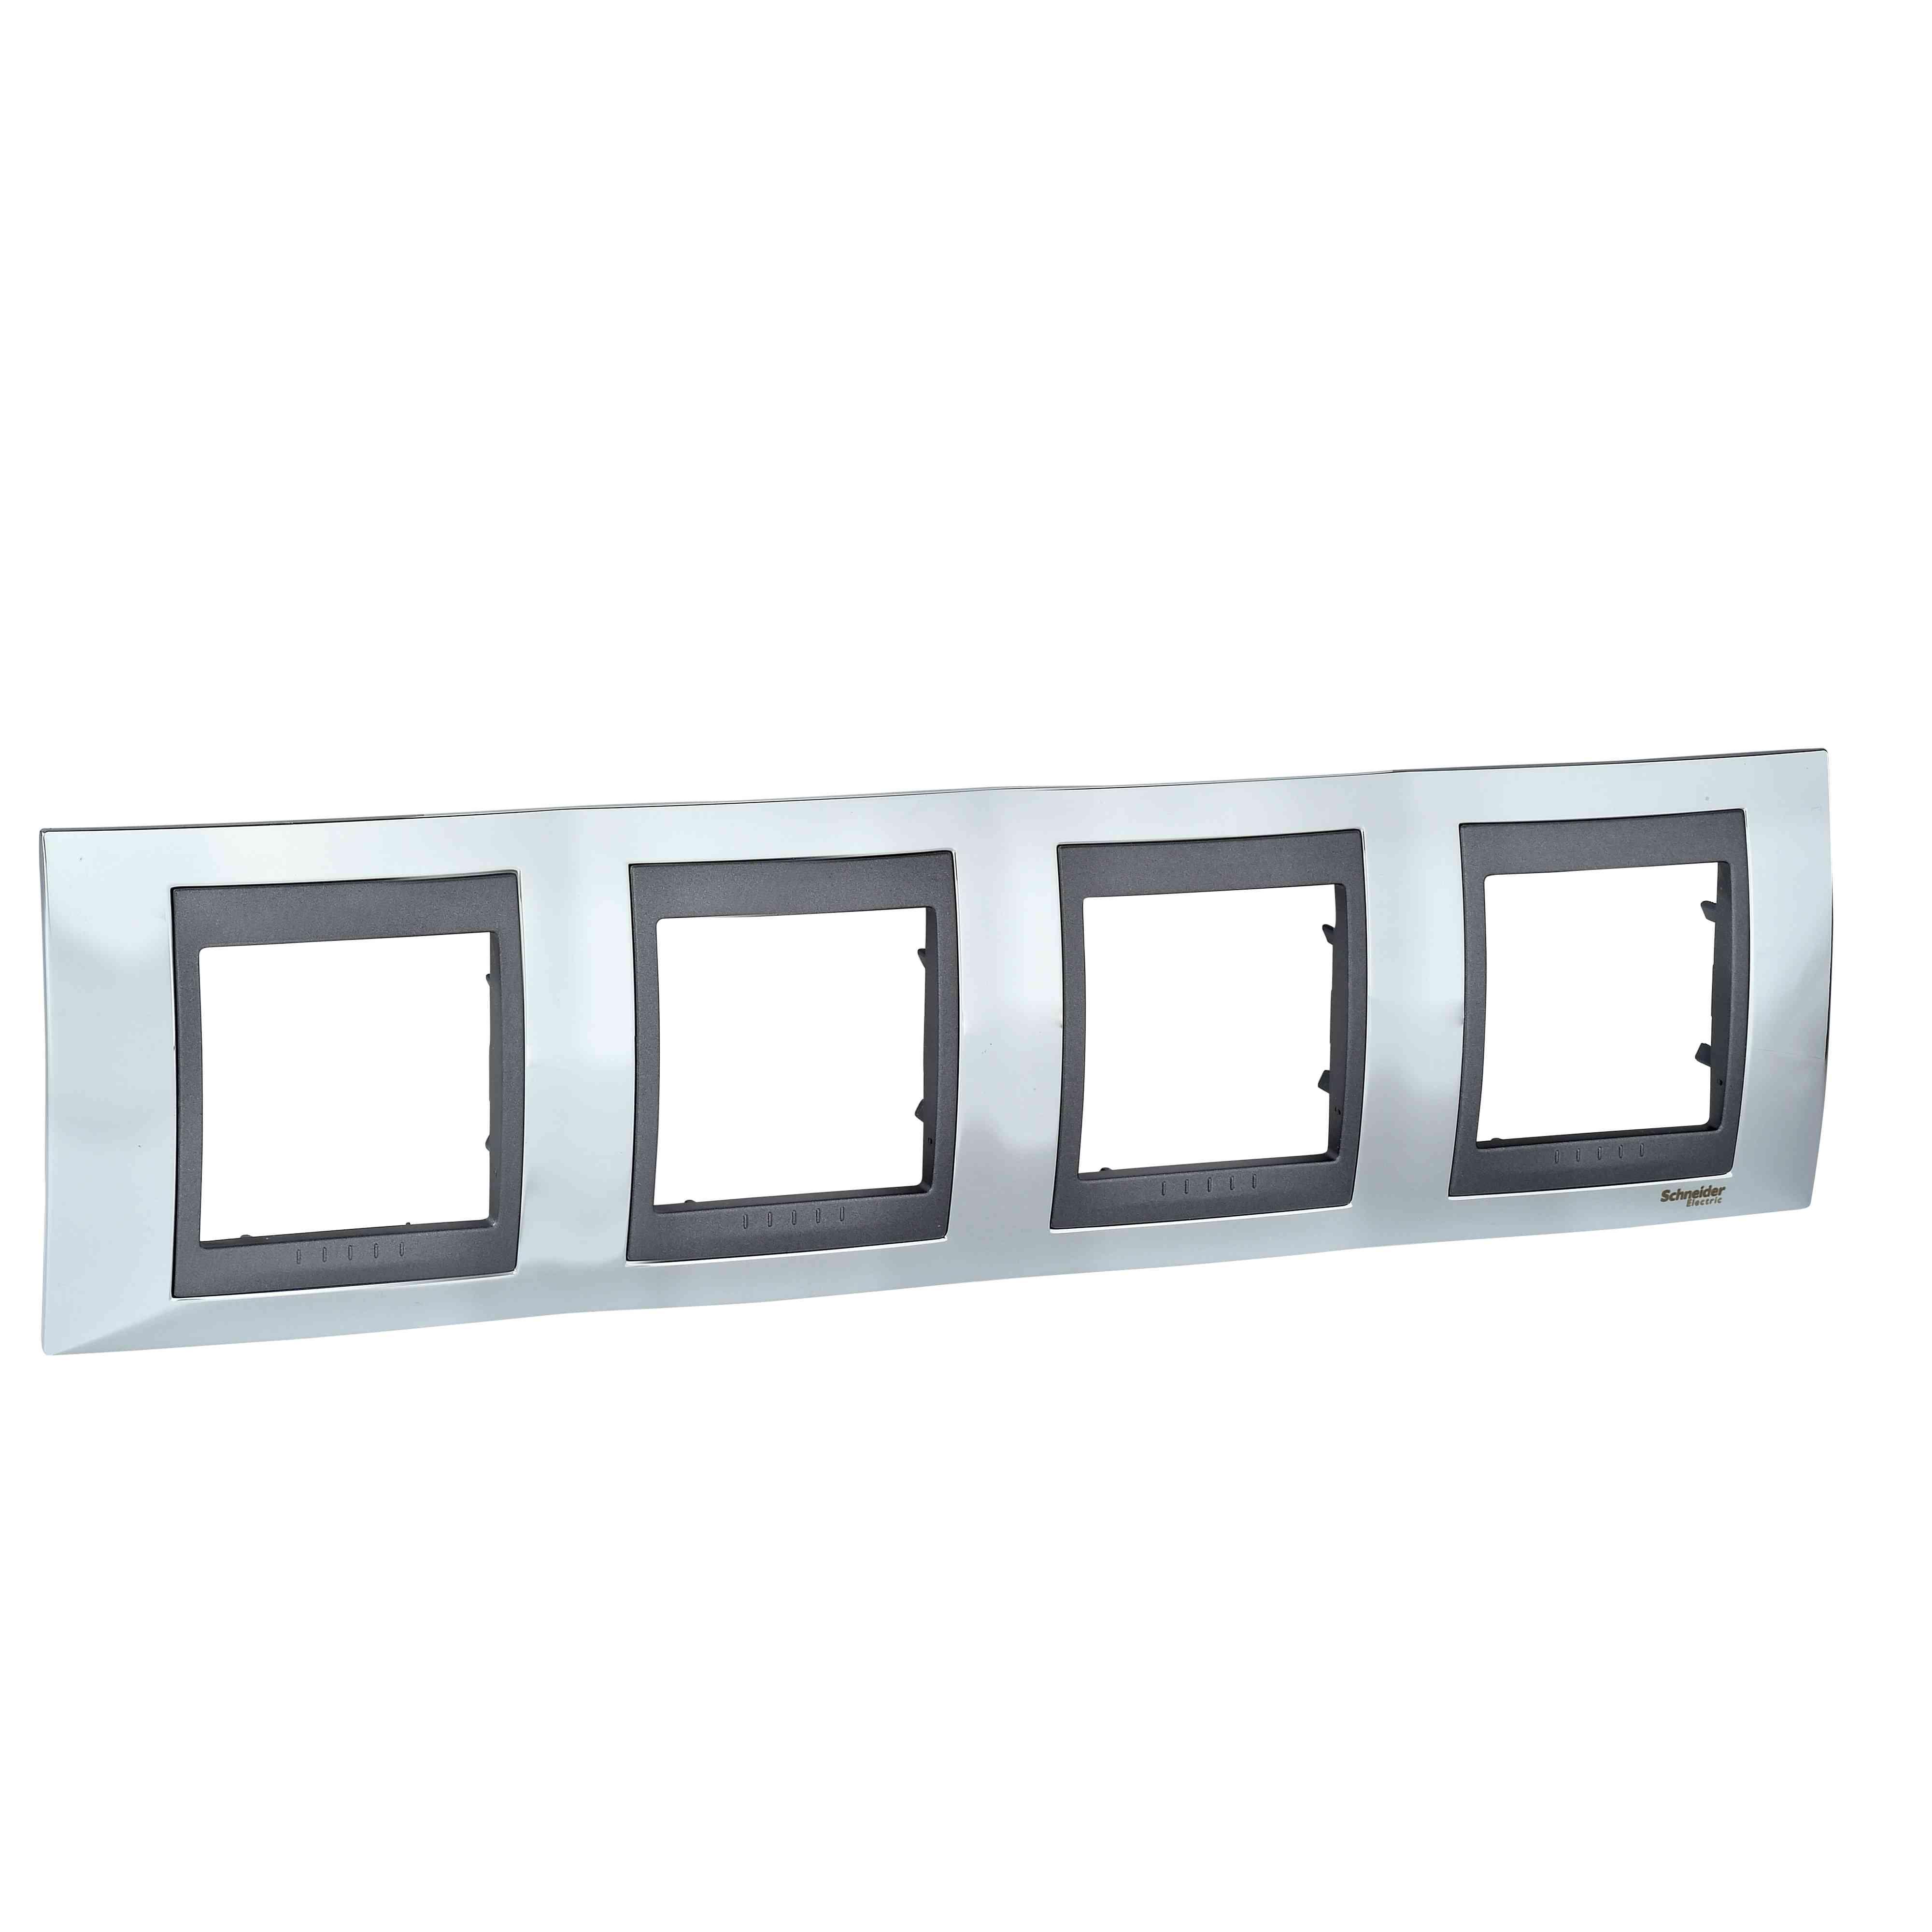 Unica Top - dekorativni okvir - 4 odprtine, H71 - b. svetlega kroma/b. grafita